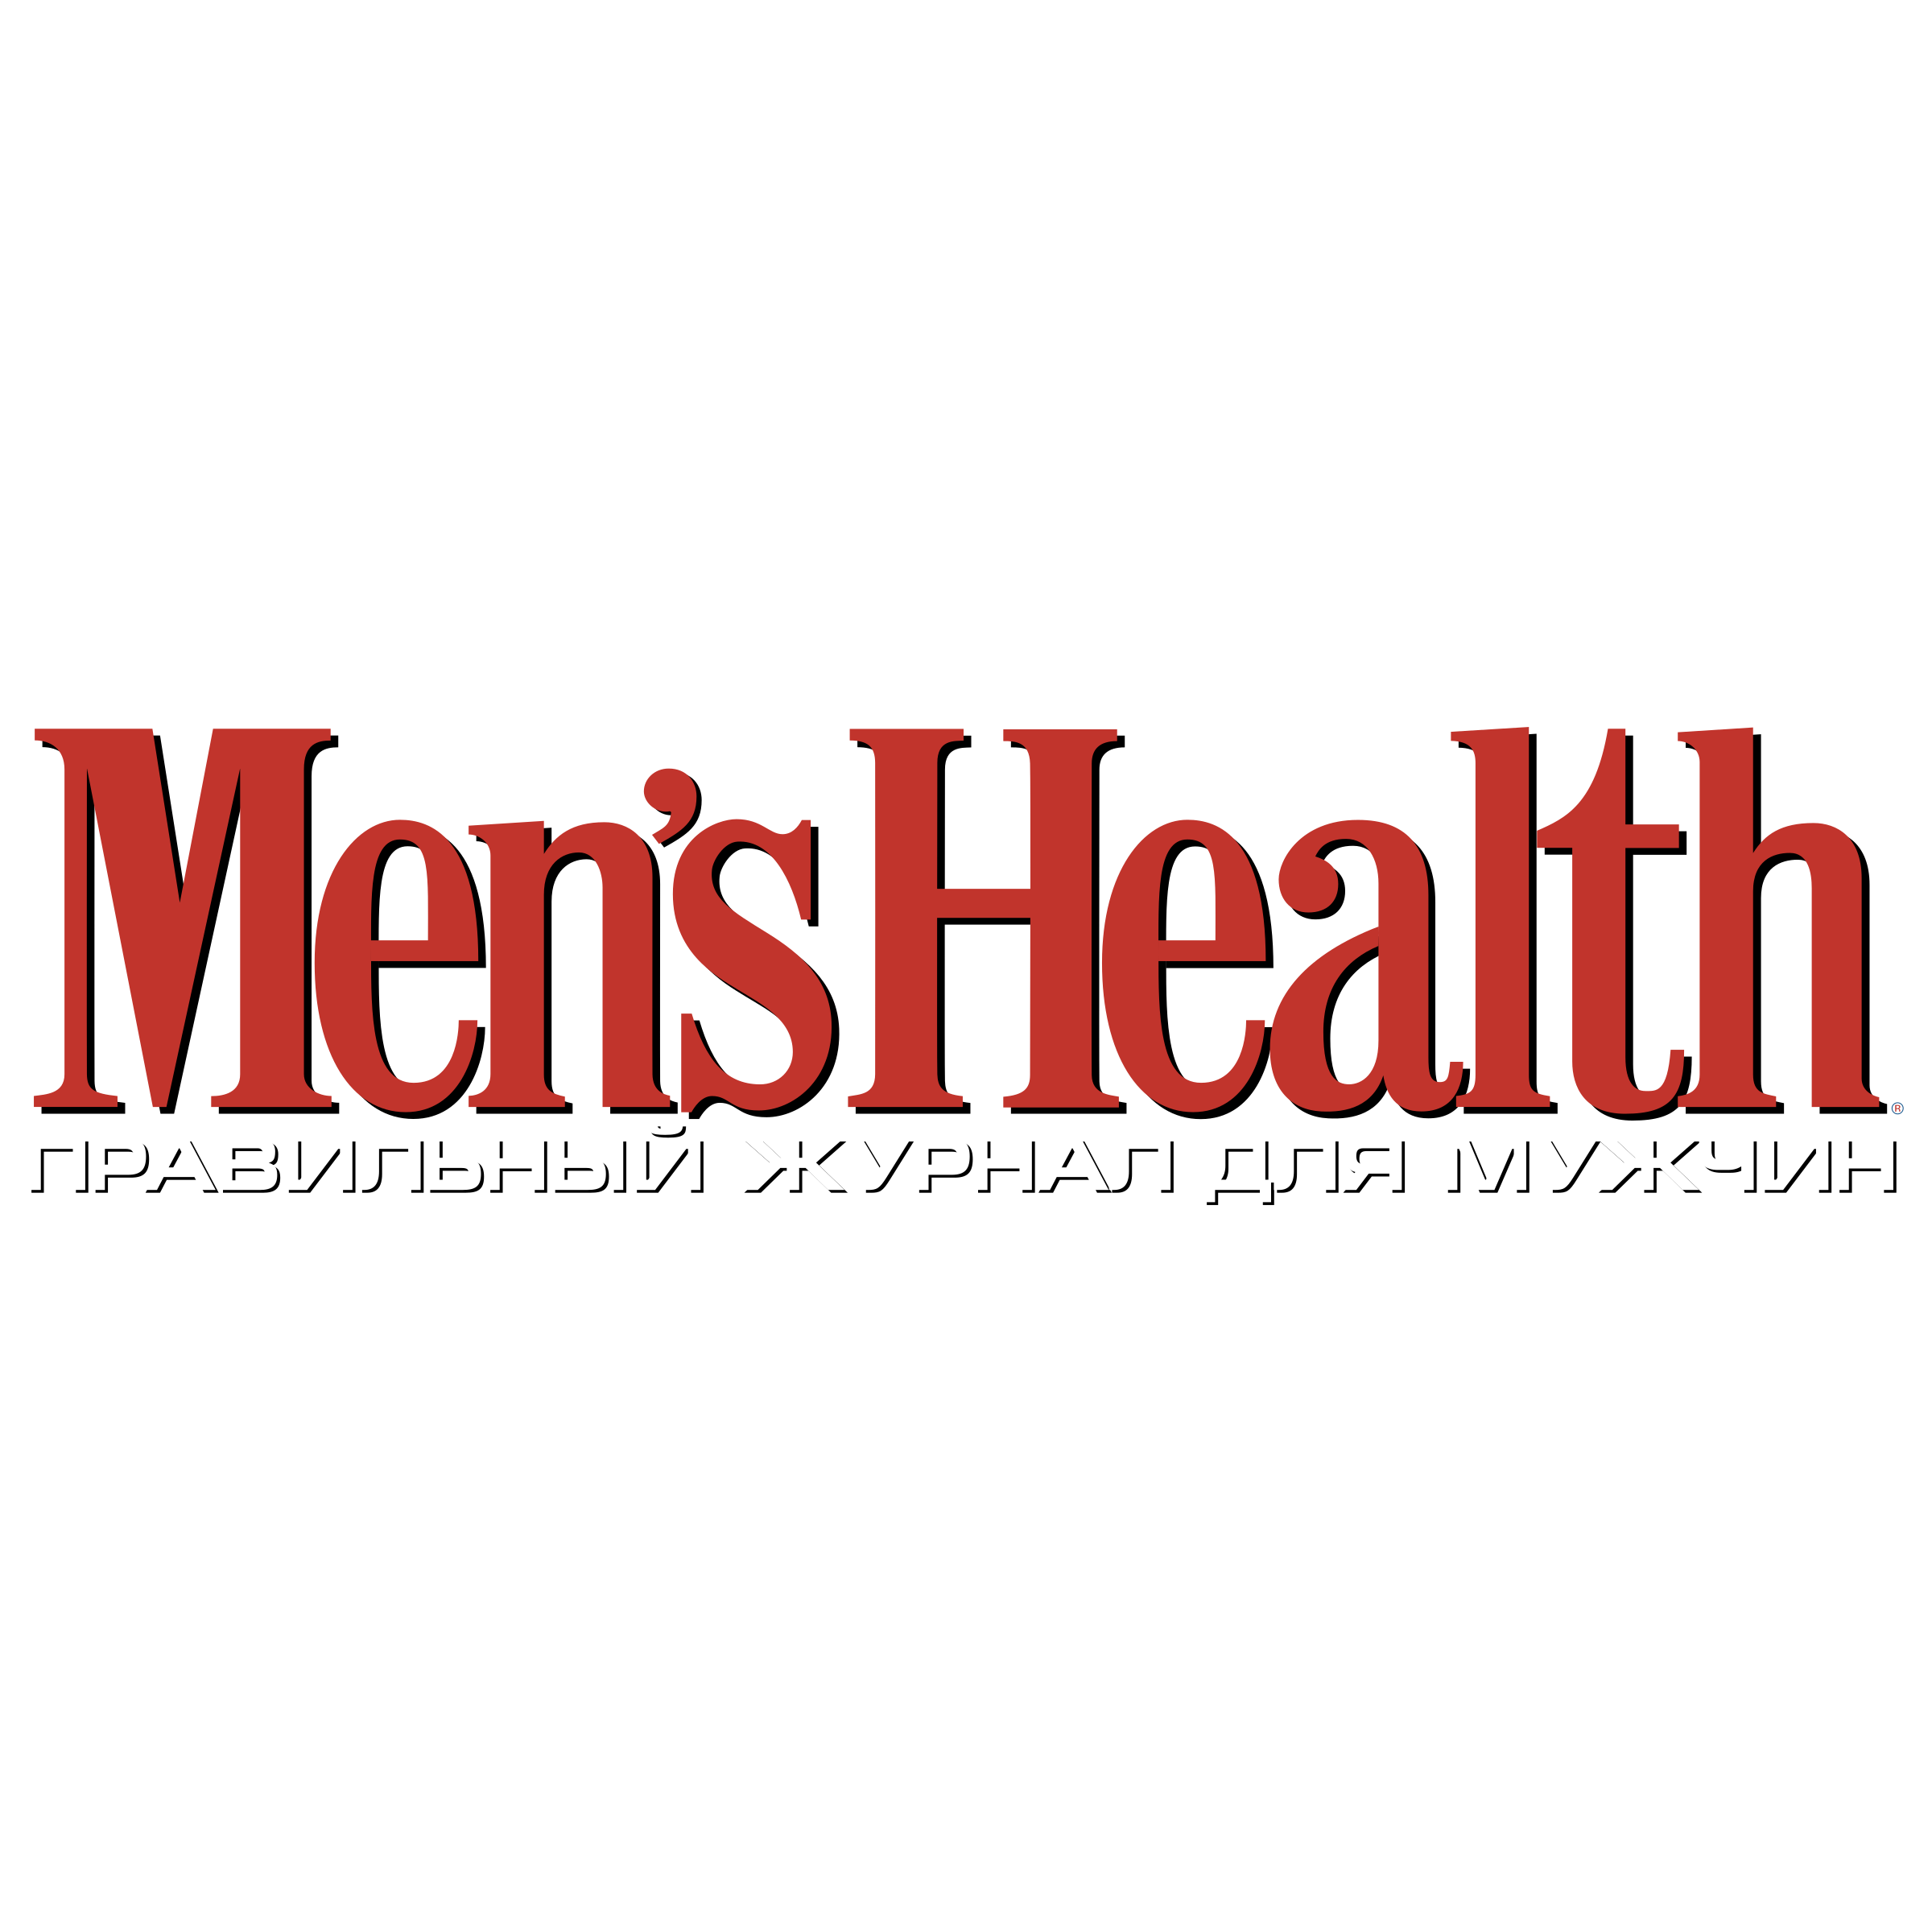 Men's Health Logo PNG Transparent & SVG Vector.